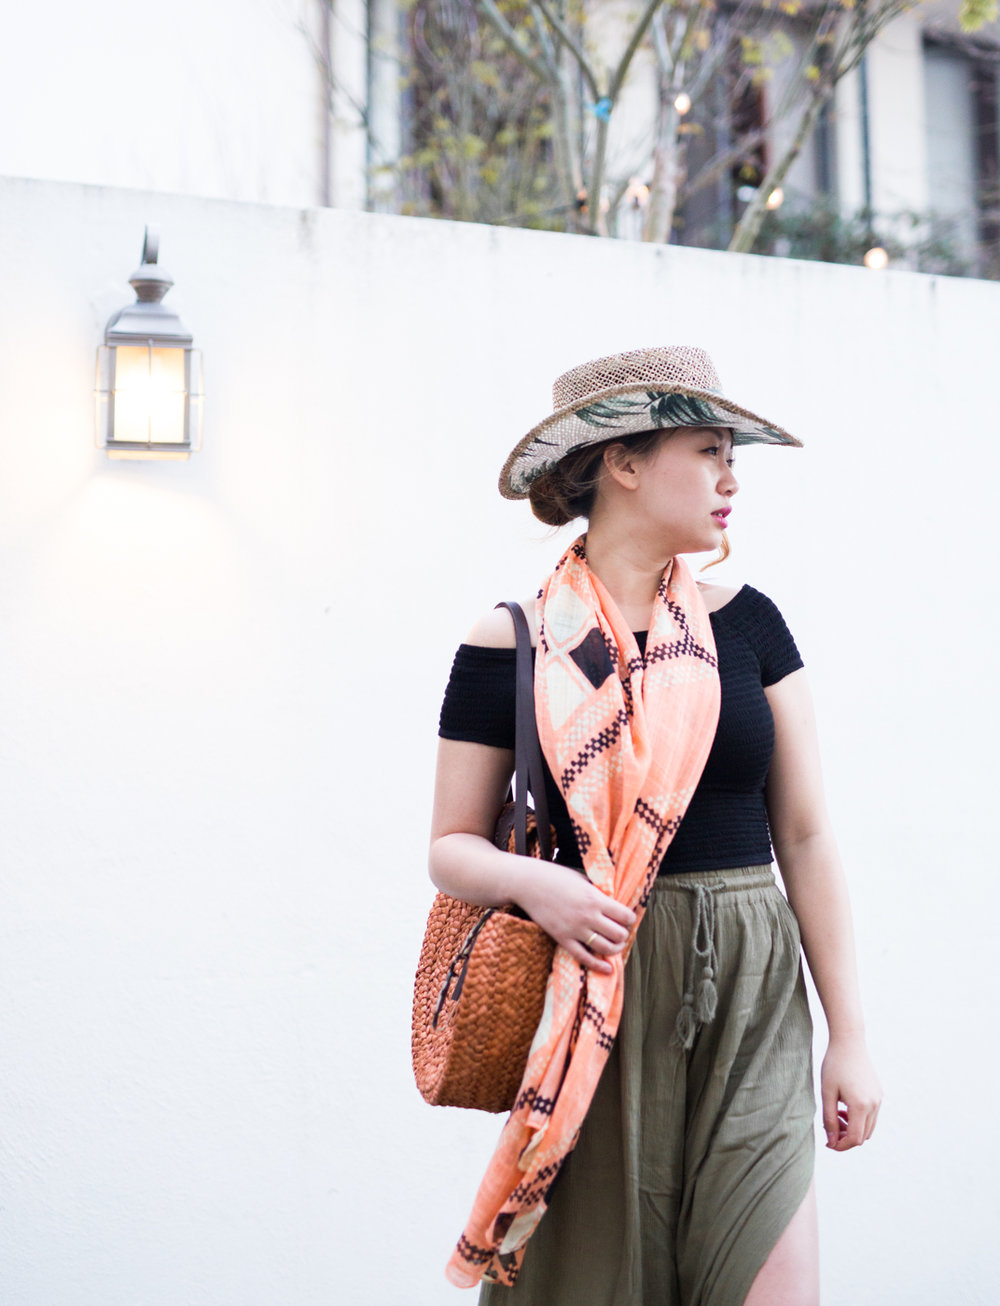 San Diego Hat Company fun geometric scarf print | The Chic Diary